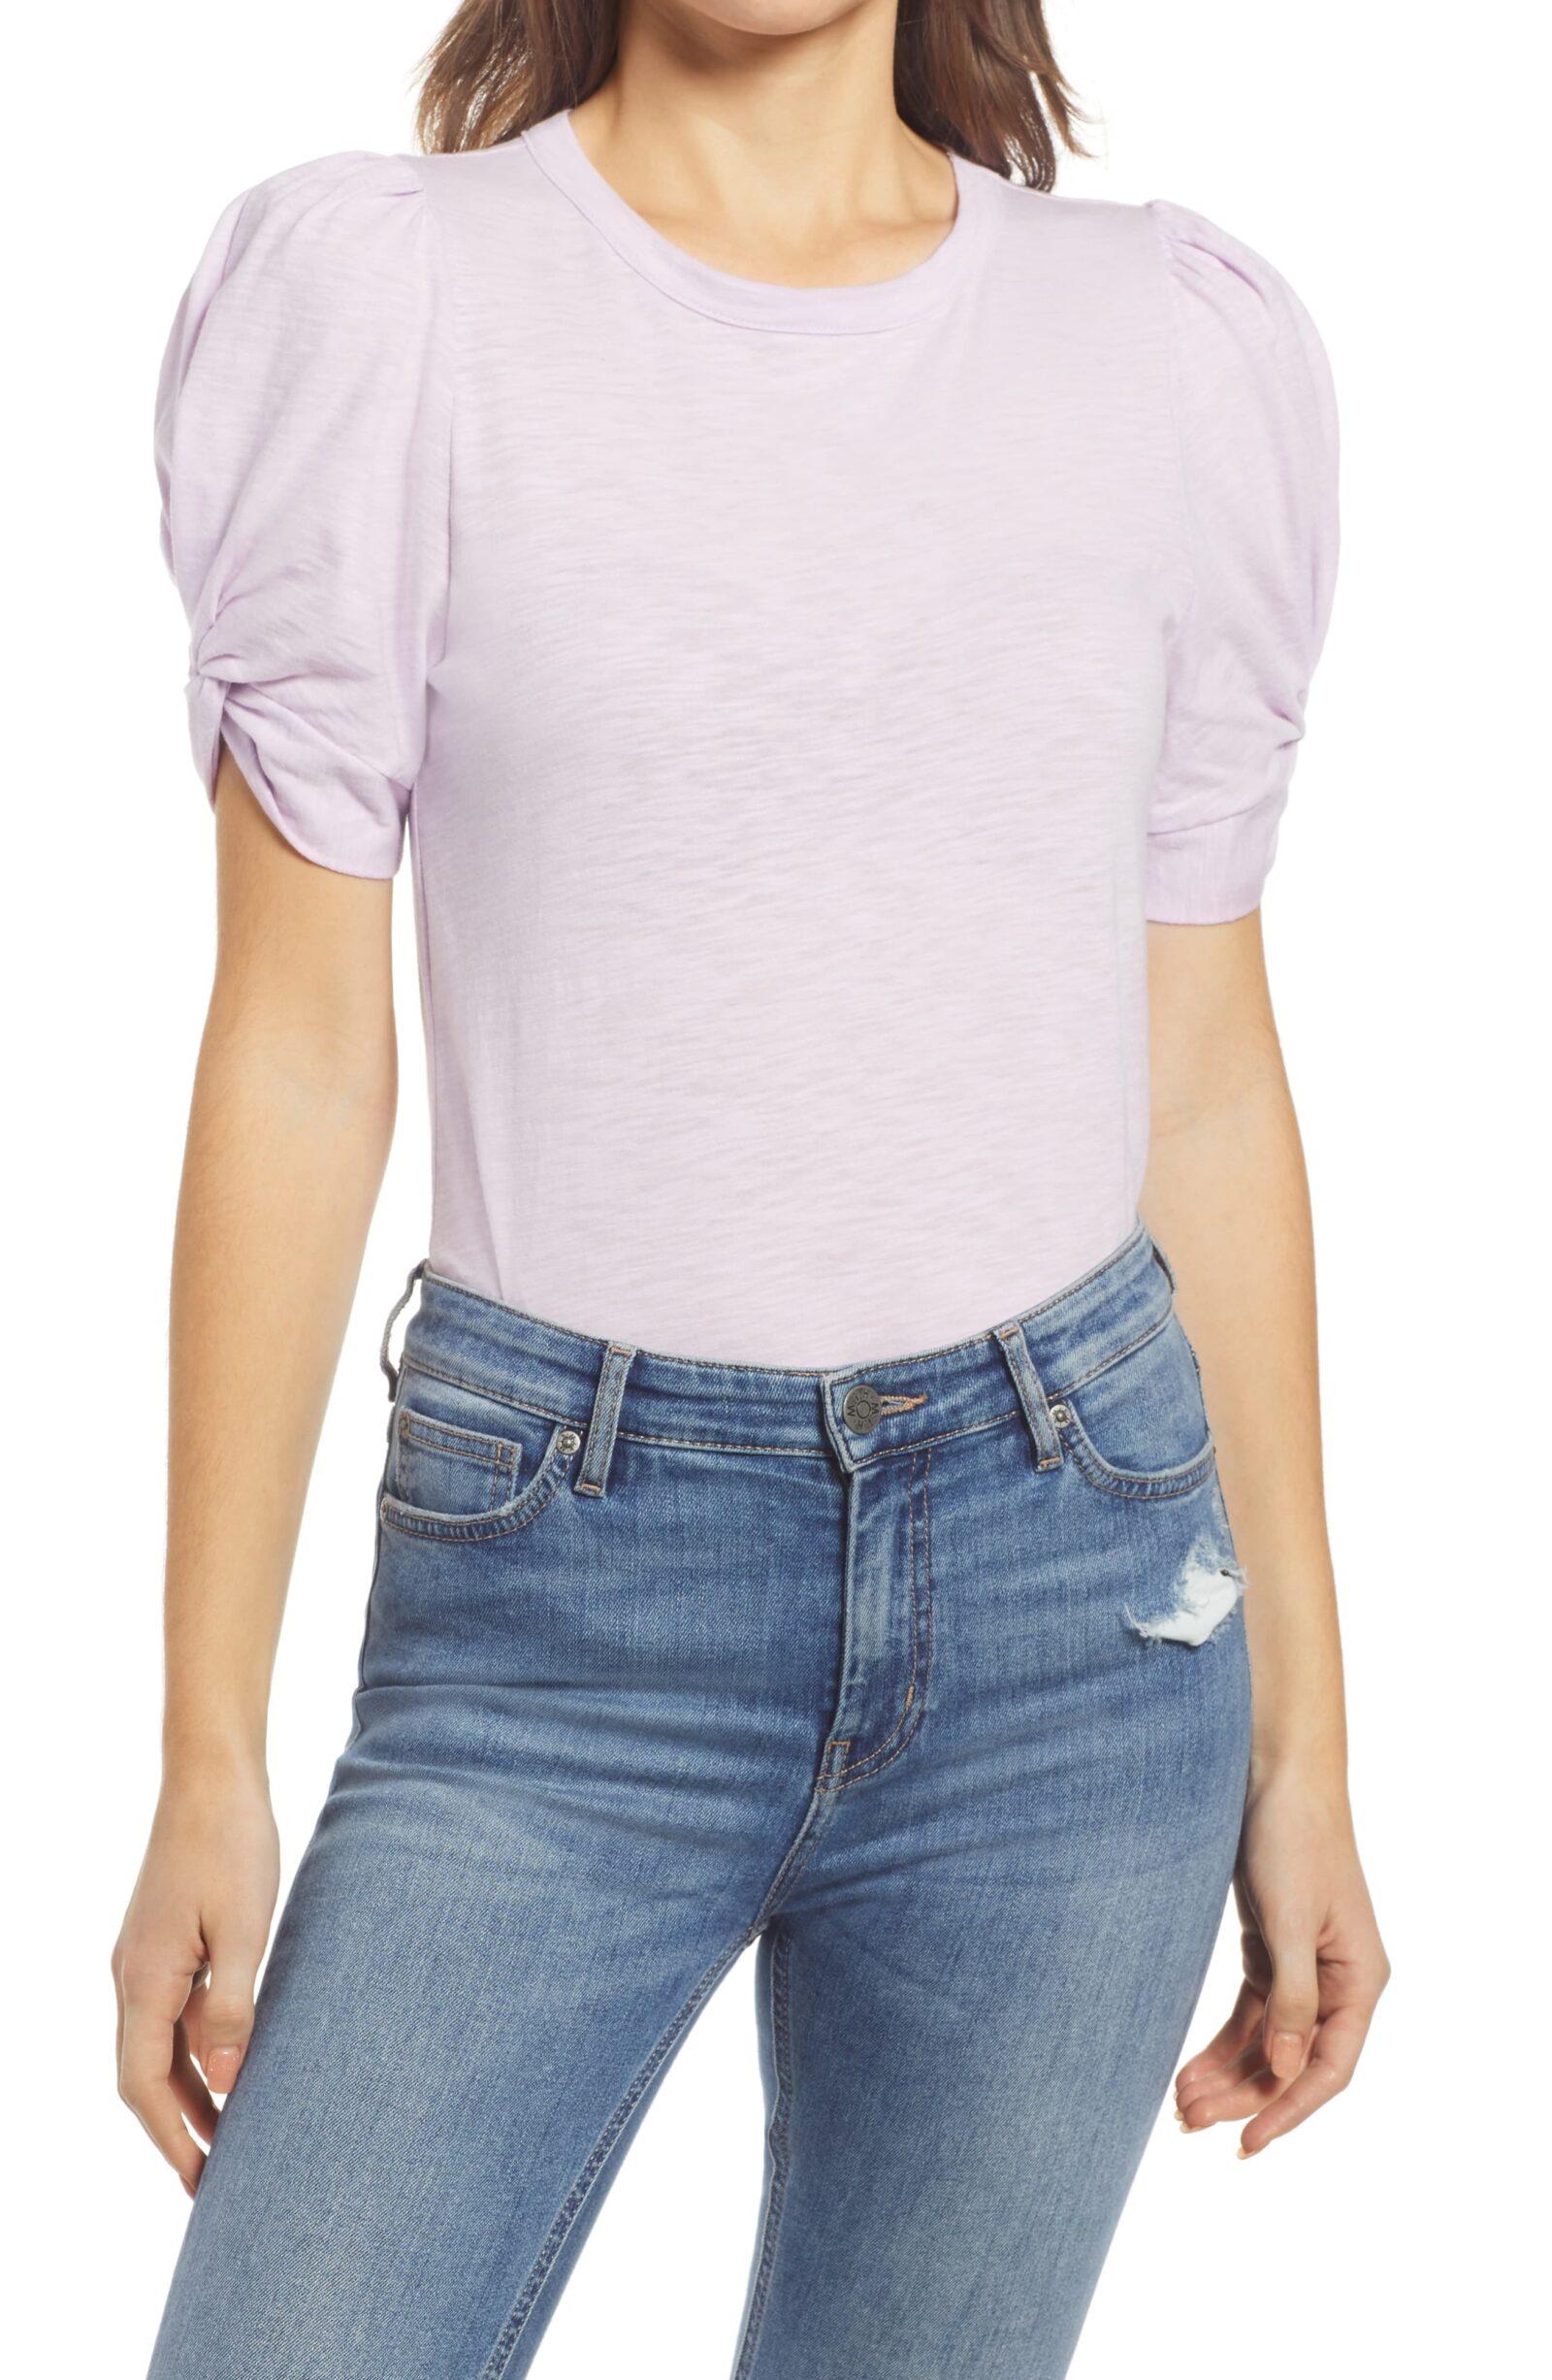 women's spring clothing